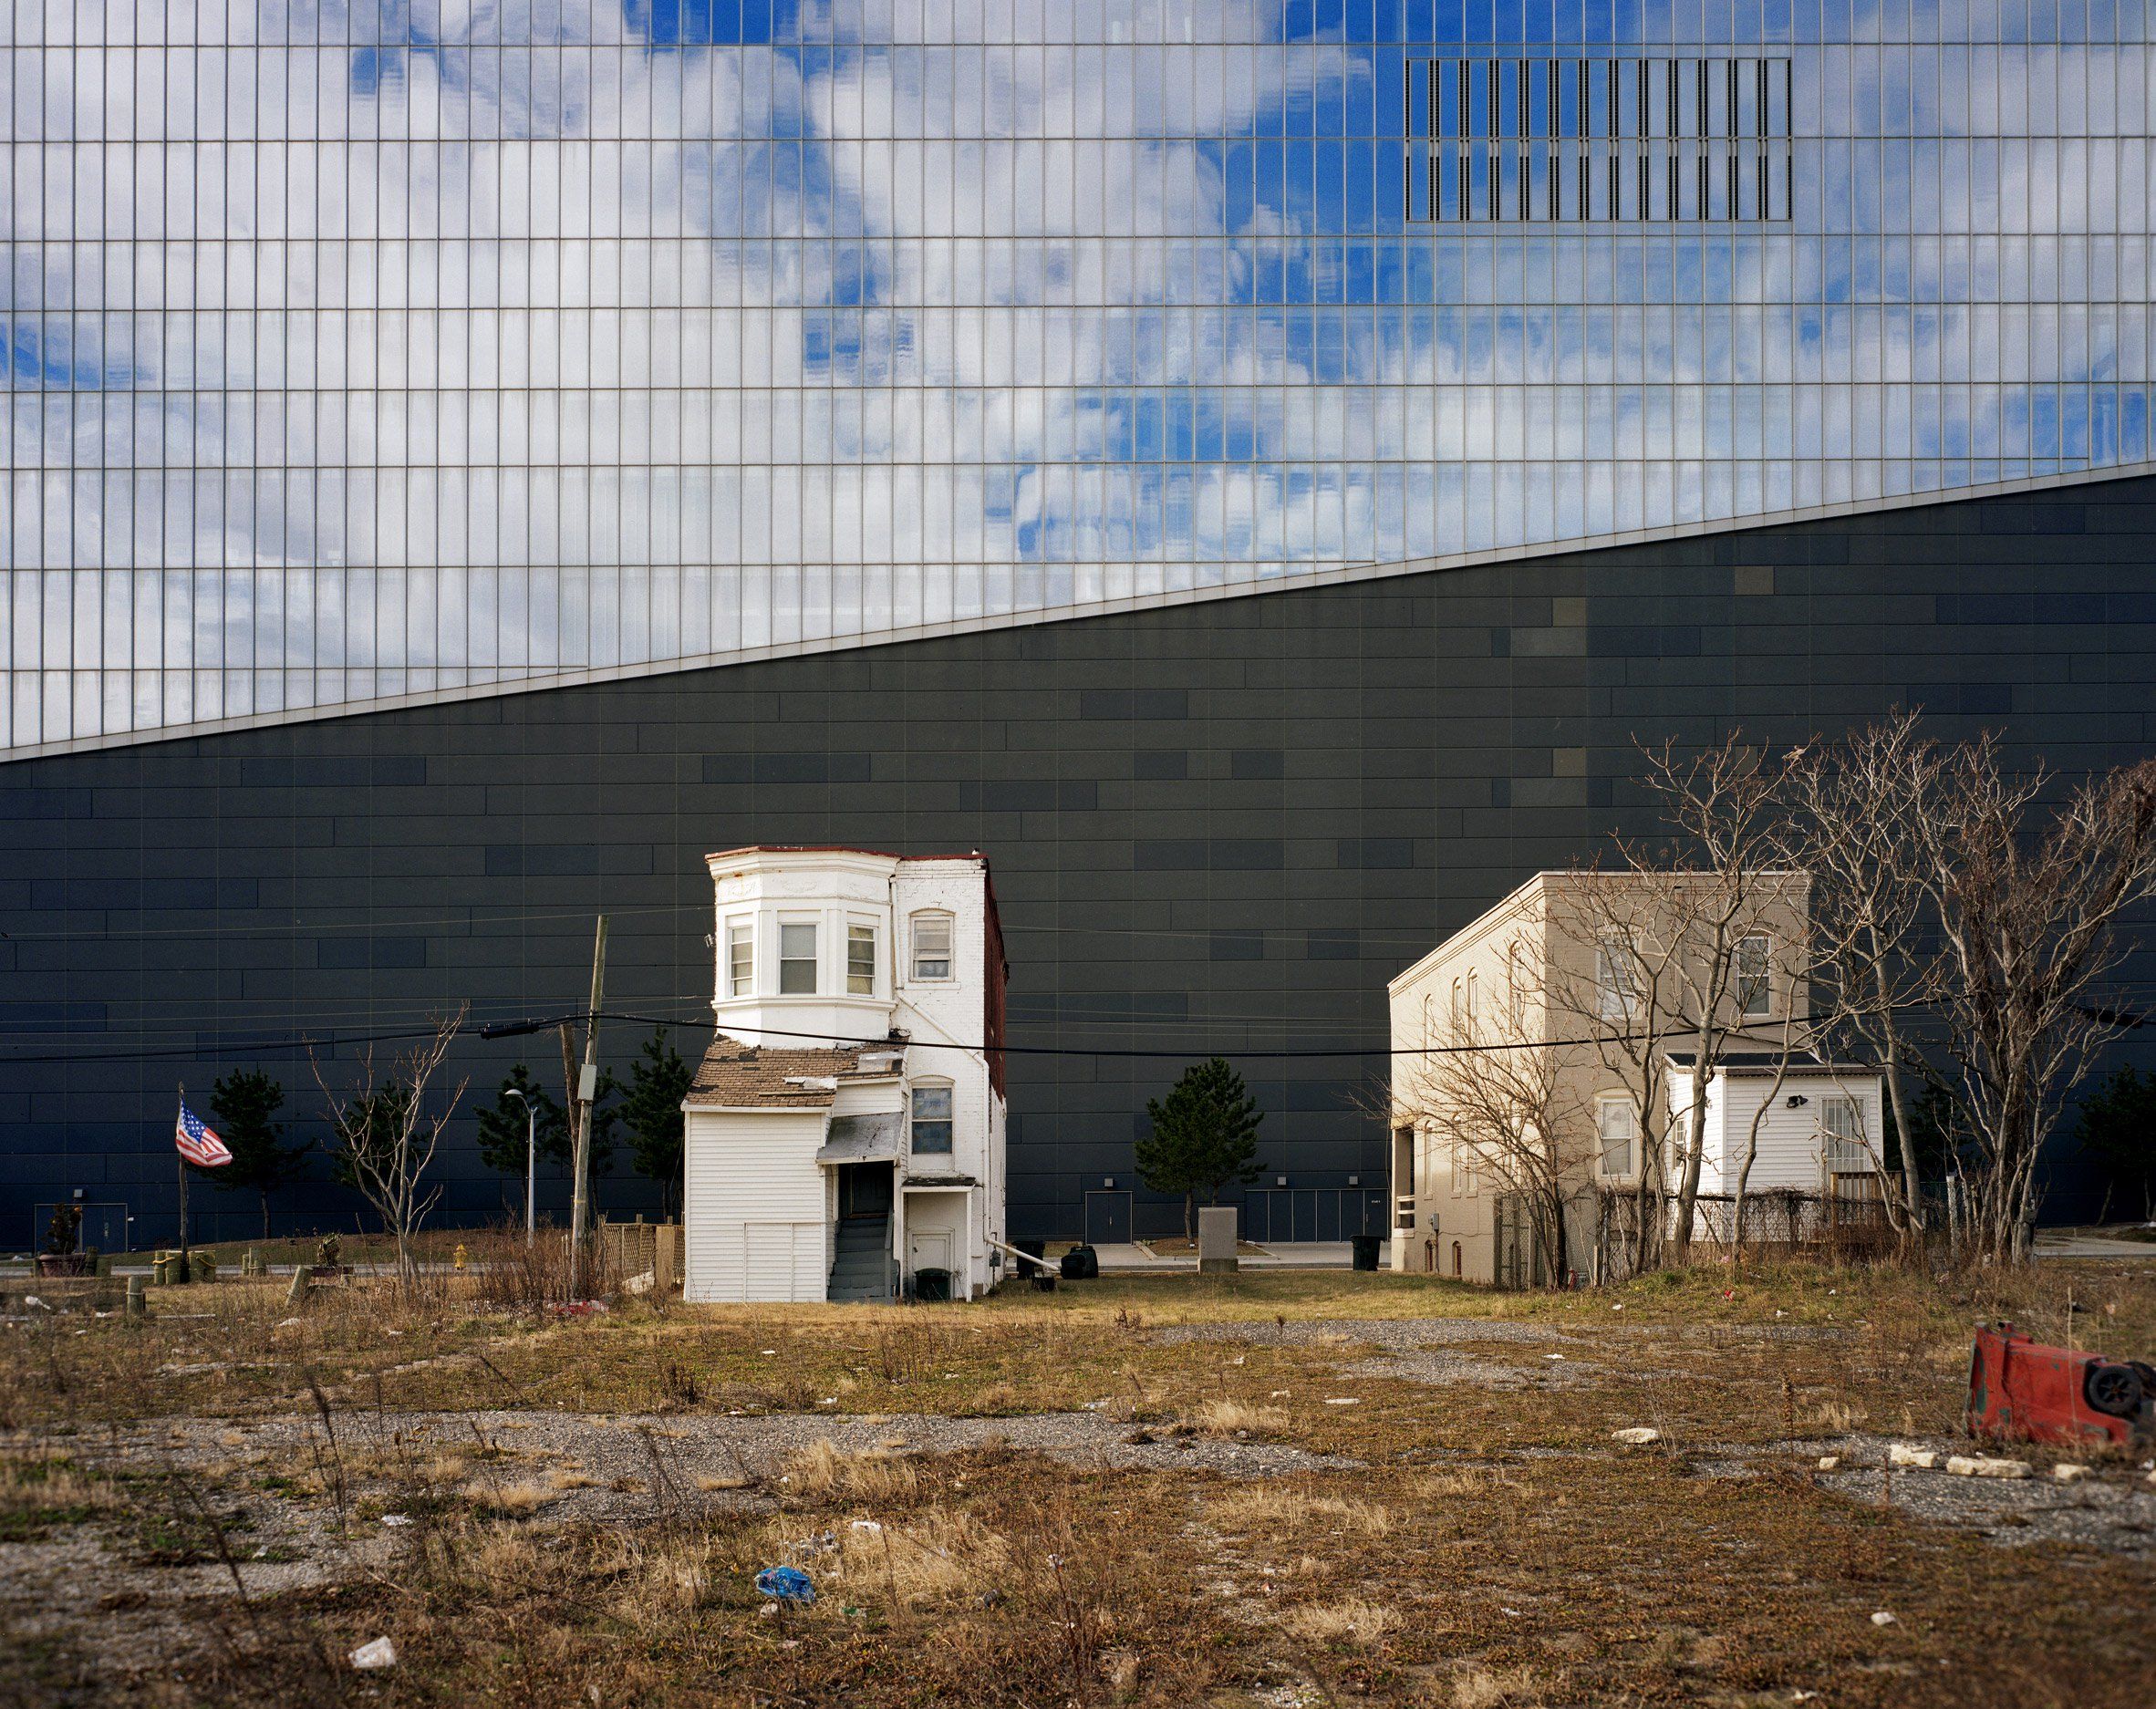 North wall of the Revel Casino, Atlantic City, New Jersey, USA